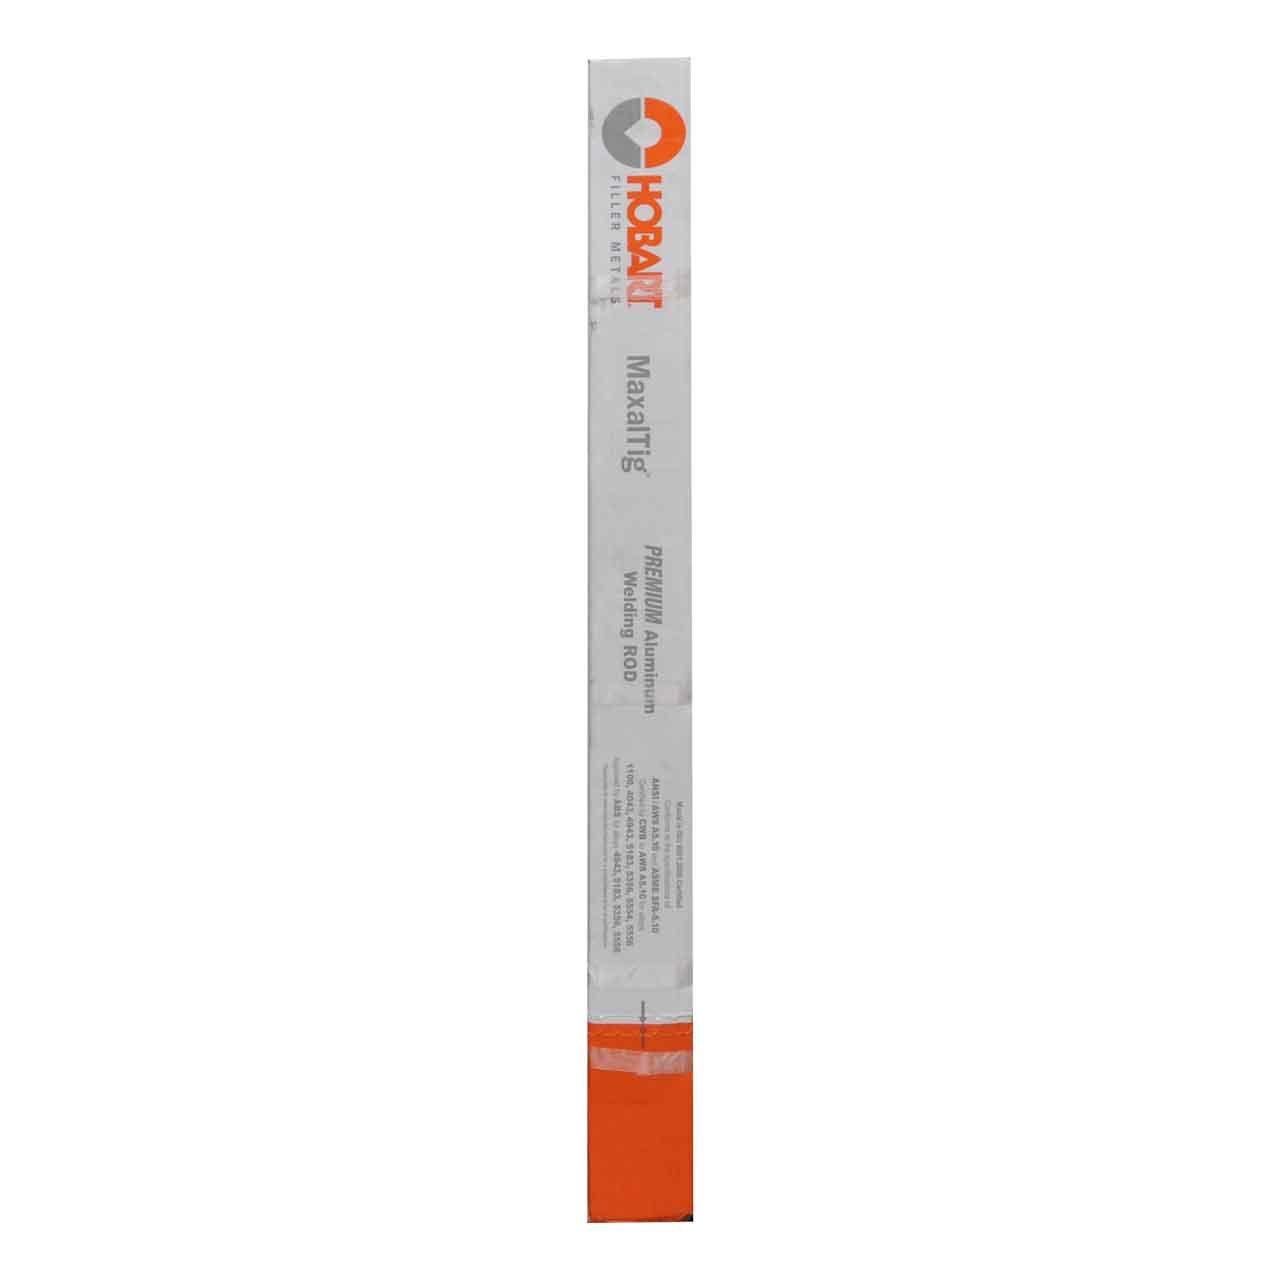 Hobart 494312570 MaxalTIG R4943 1/8'' X 36'' Aluminum Tig Filler Rod 10#